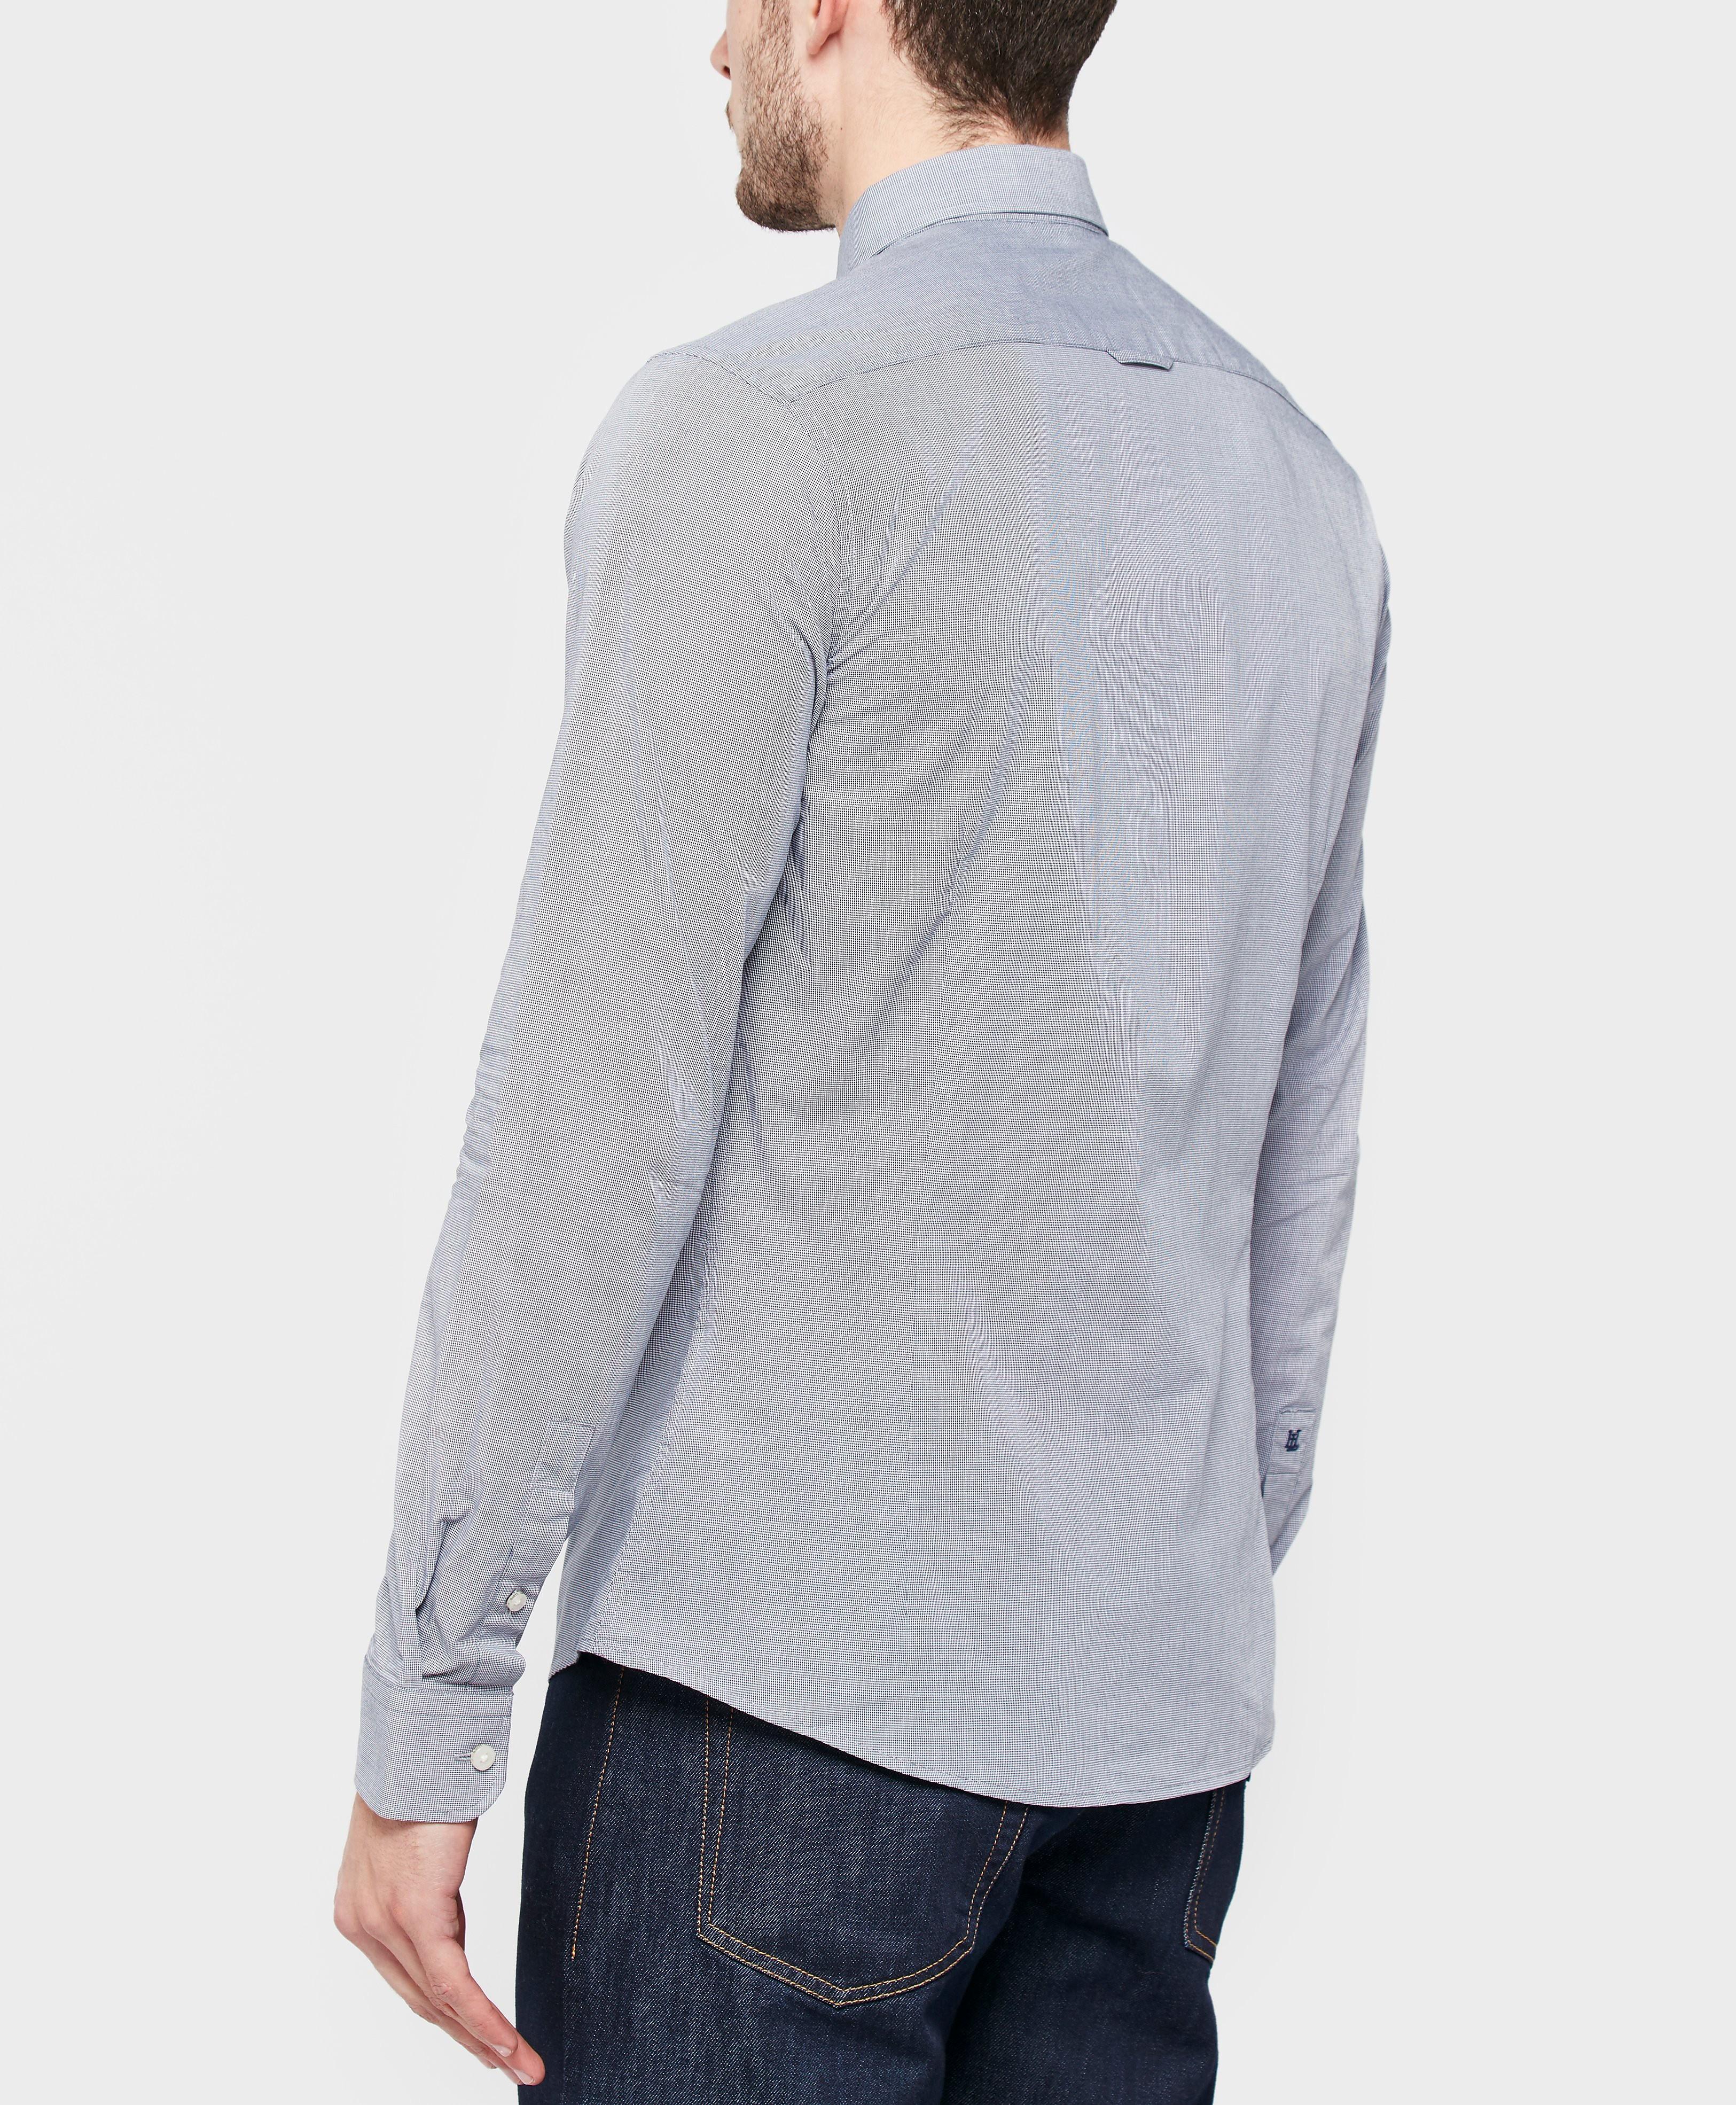 Henri Lloyd Micro Hounds Shirt